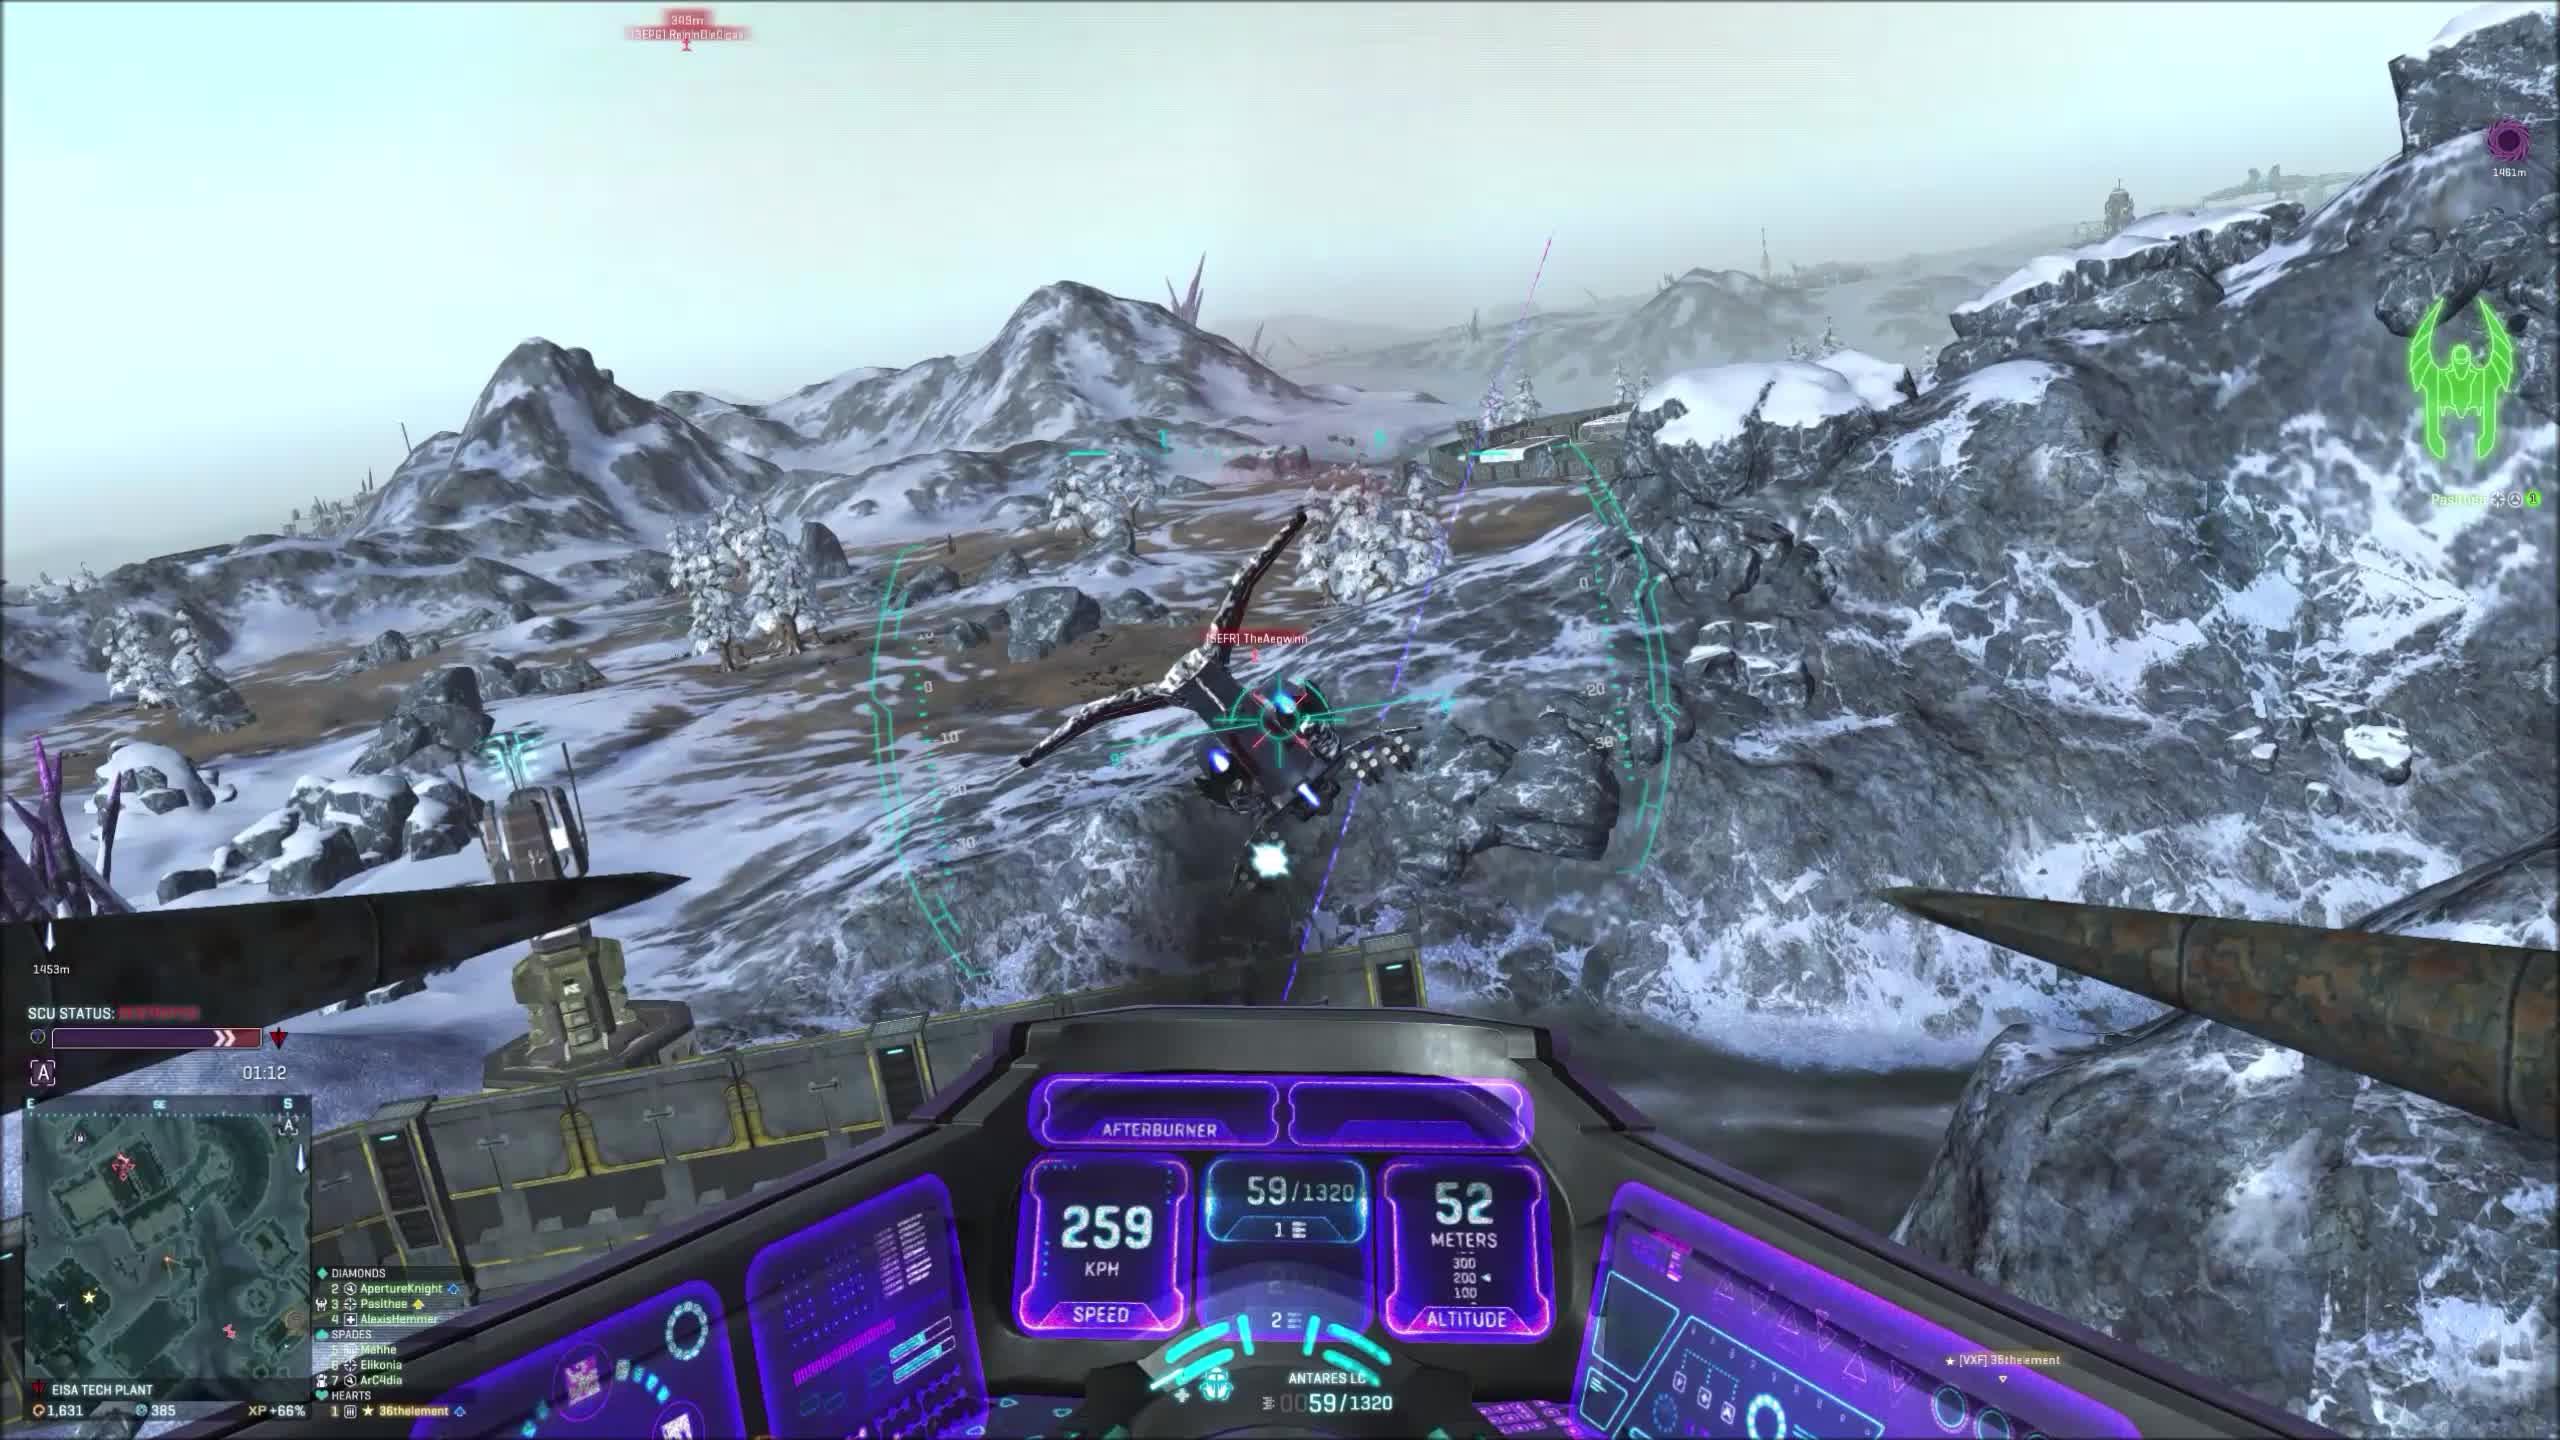 PS2, PS:A, PSA, Planetside, Planetside 2, Planetside Arena, Planetside2, I save you Senpai GIFs